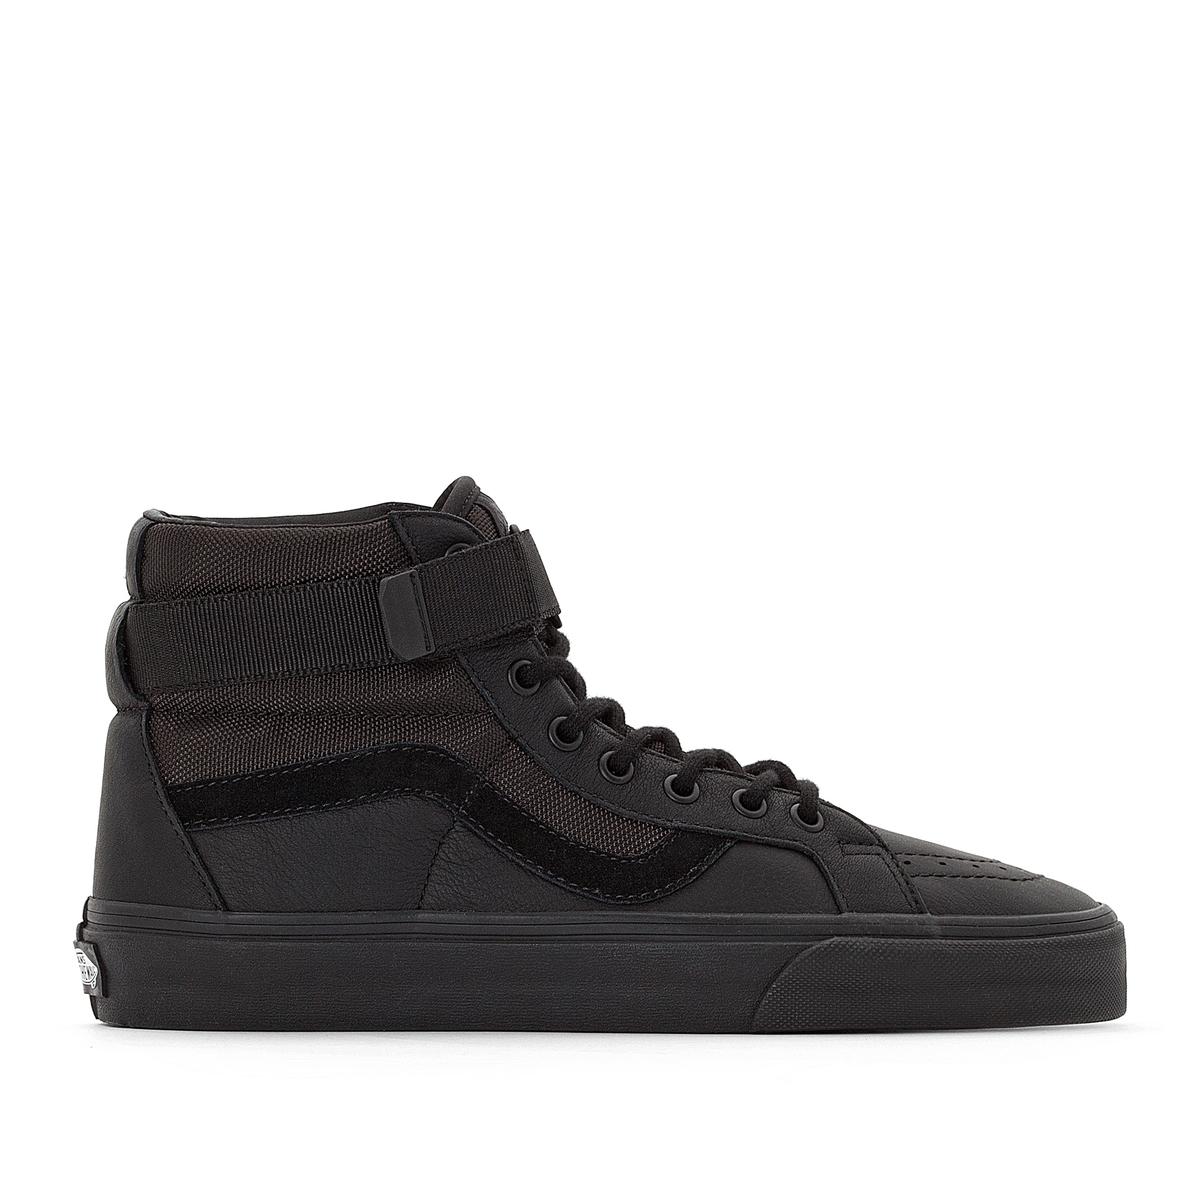 Zapatillas de caña alta UA SK8-Hi Reissue Strap